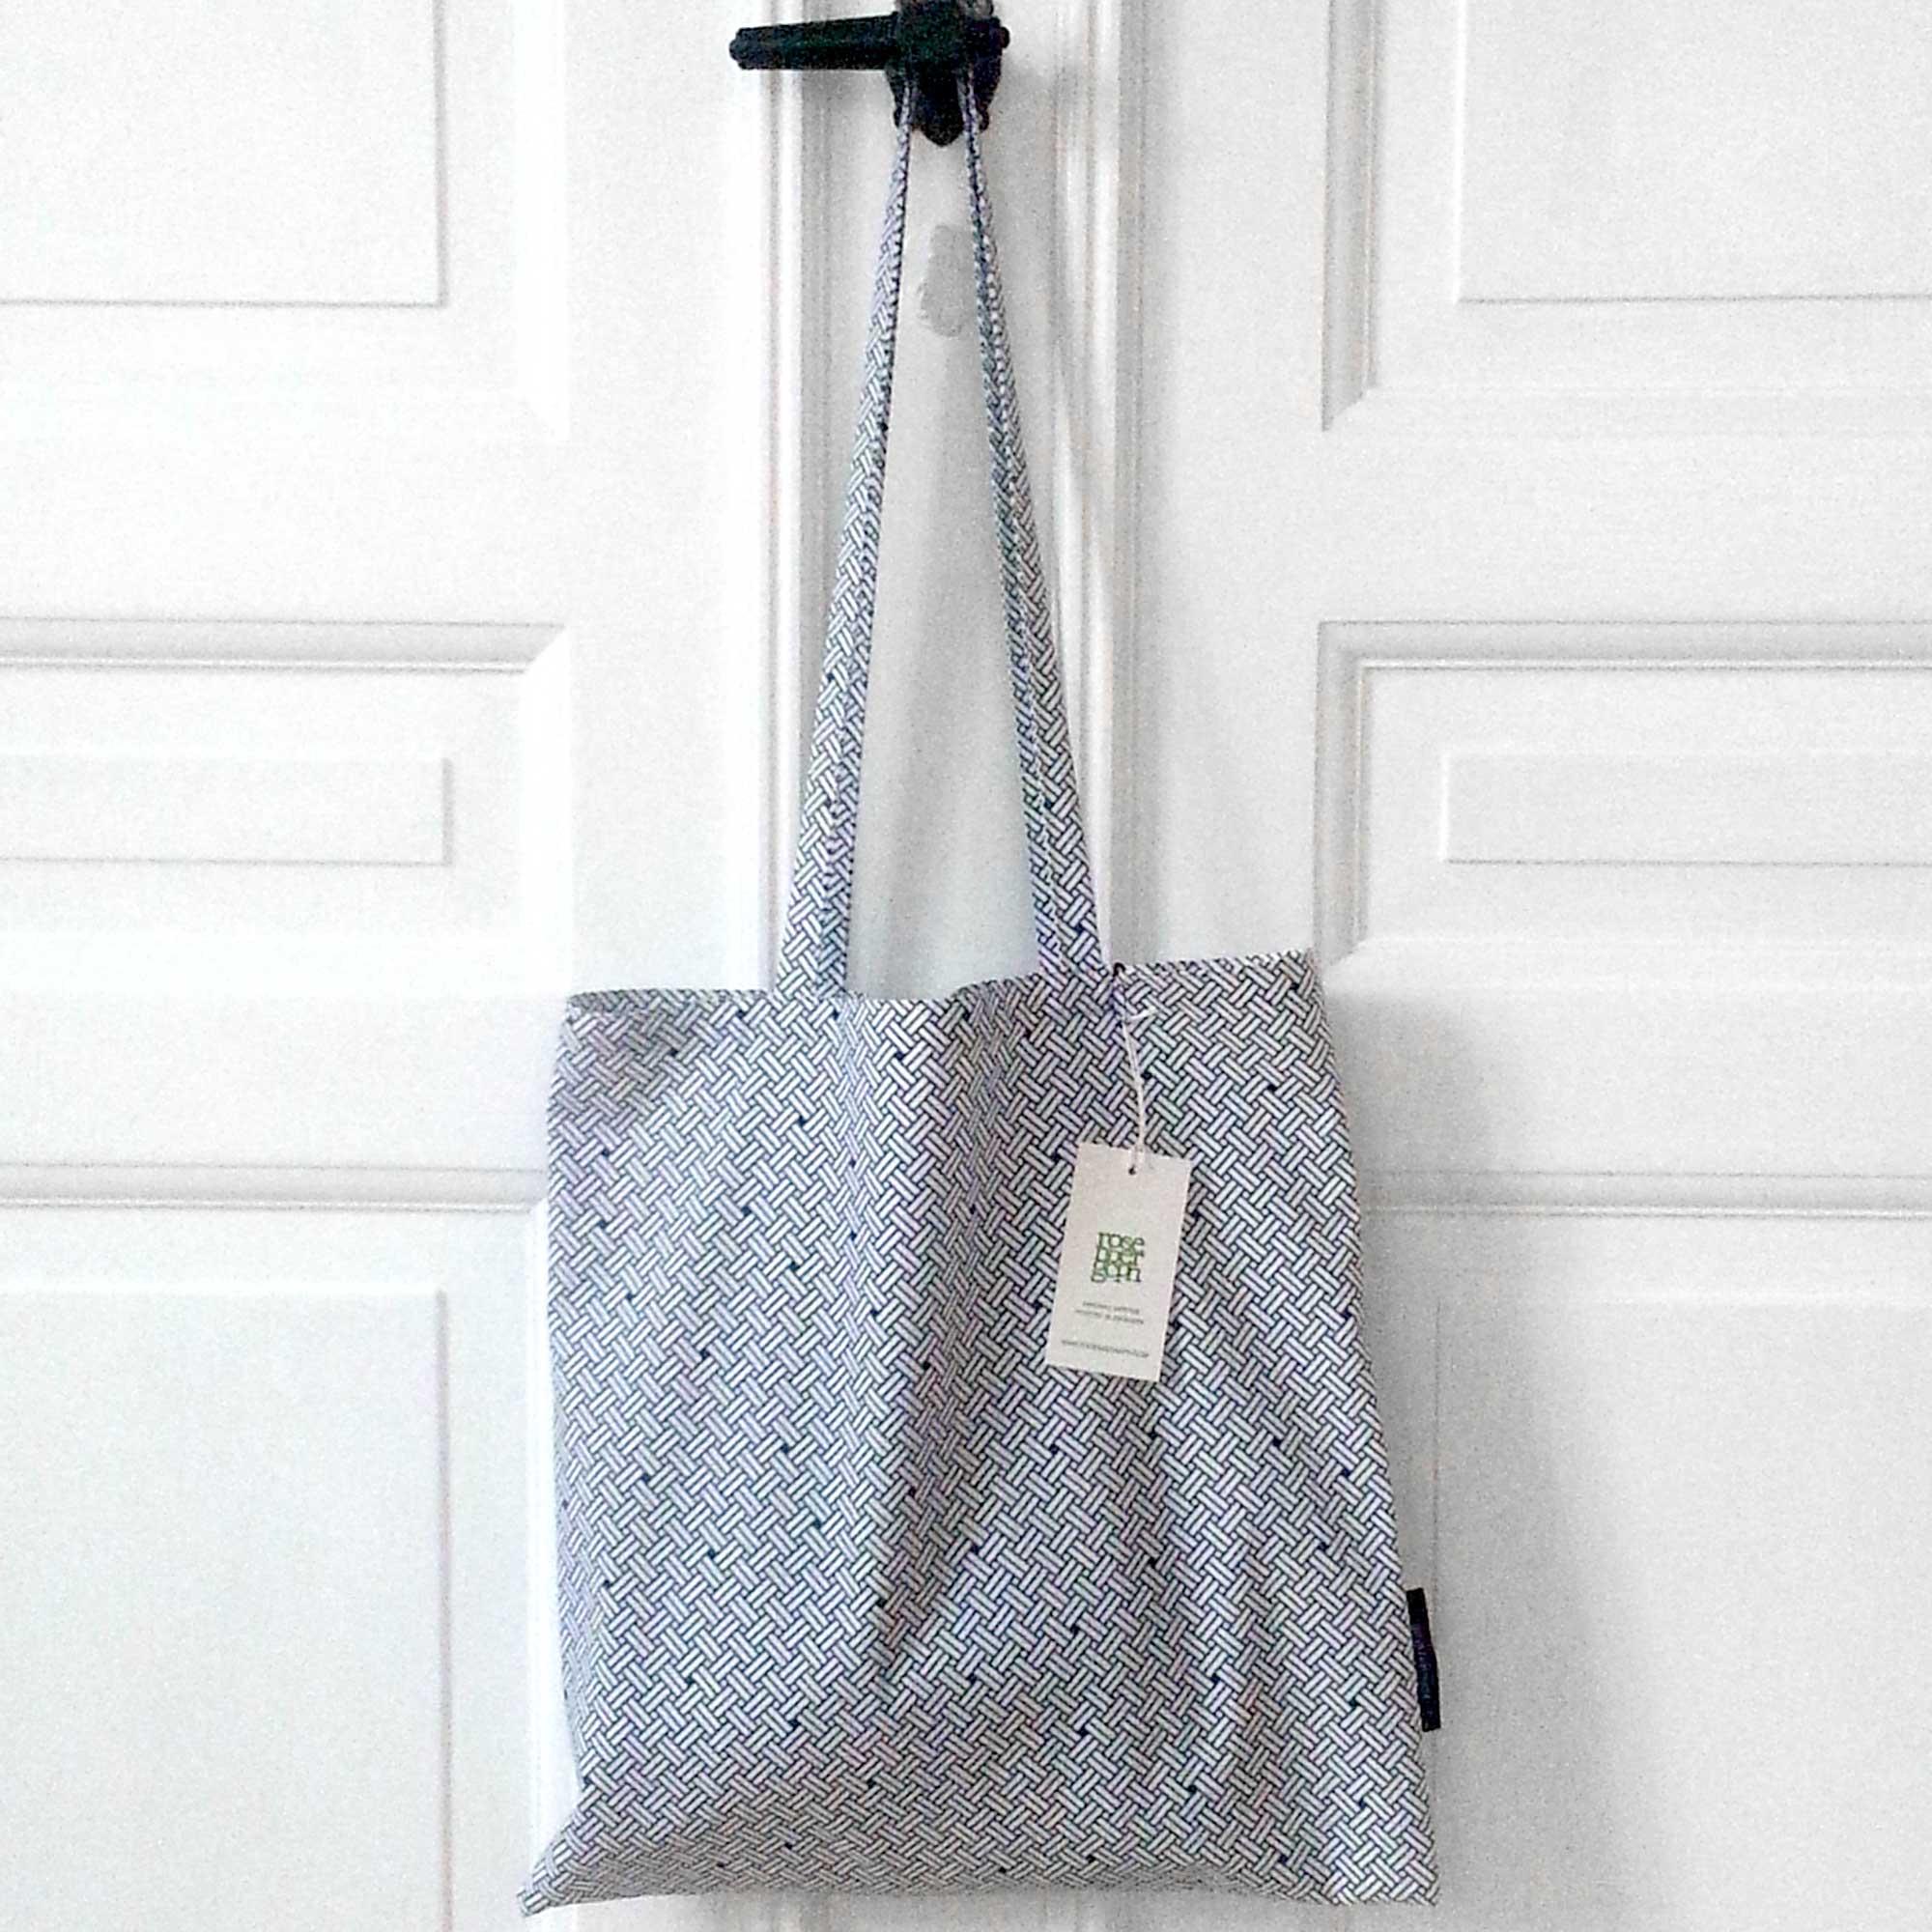 Shopping net, Weave navy blue, organic cotton